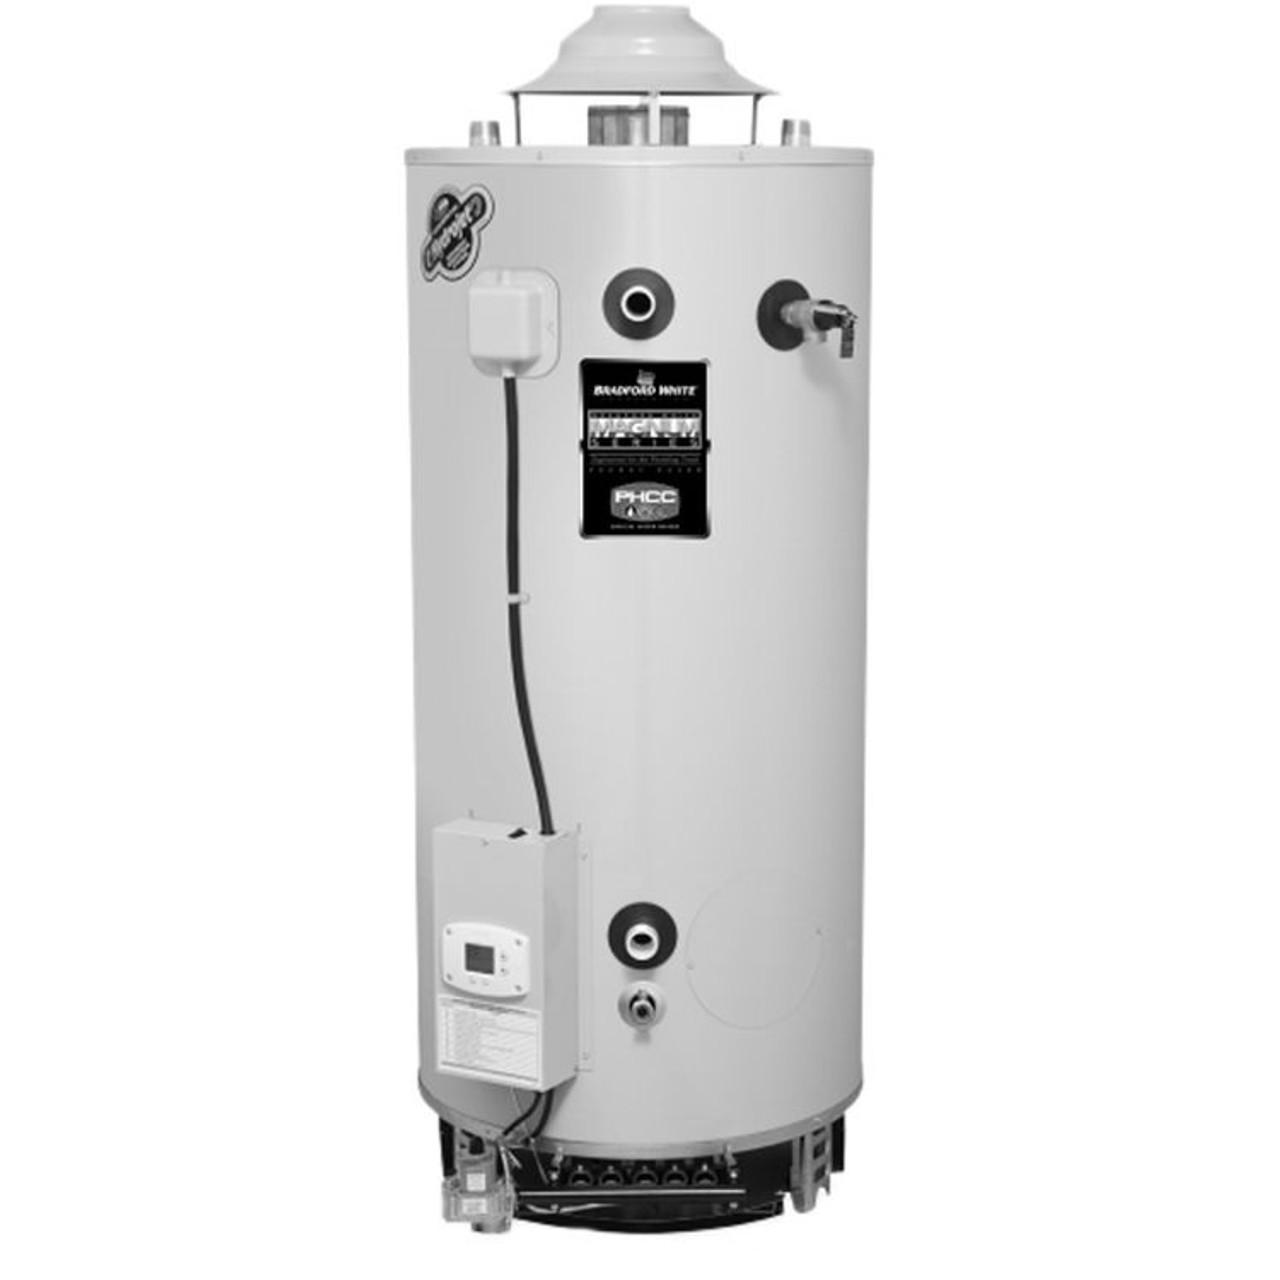 Bradford Water Heater >> Bradford White Lg100h 85 3n 100 Gallon 85 000 Btu Light Duty Commercial Ultra Low Nox Water Heater